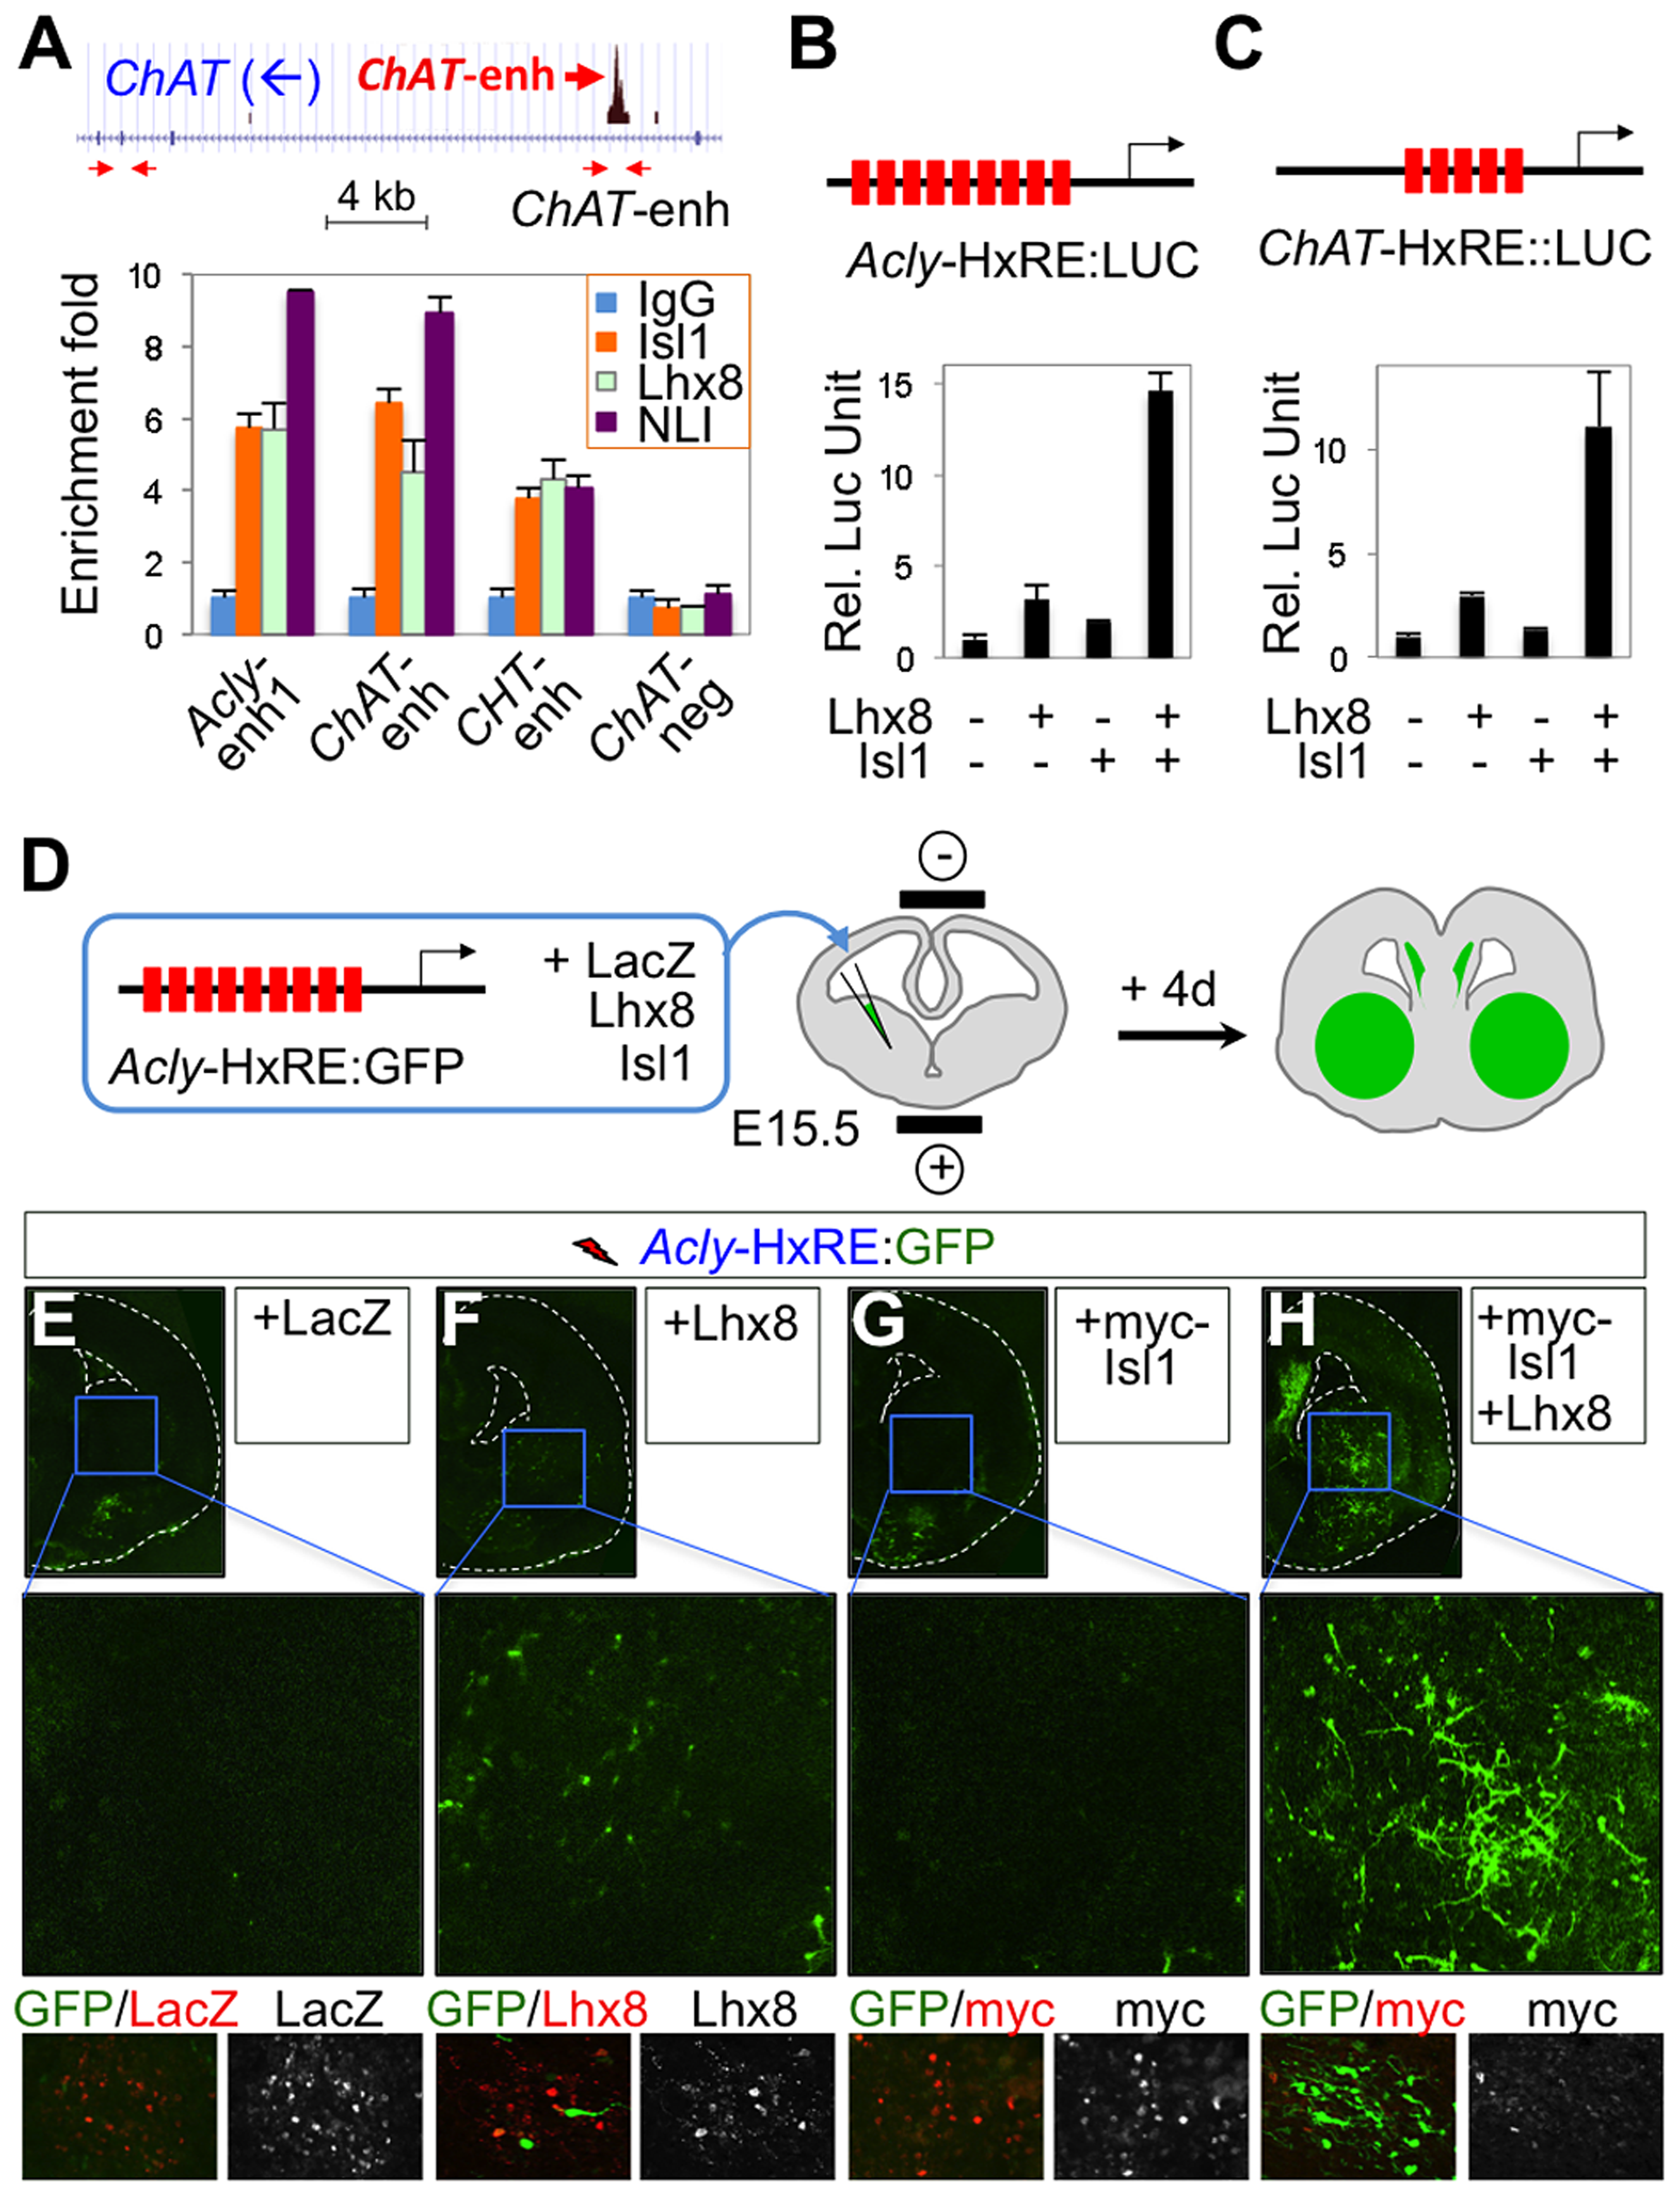 The Isl1-Lhx8-hexamer activates the cholinergic genes.